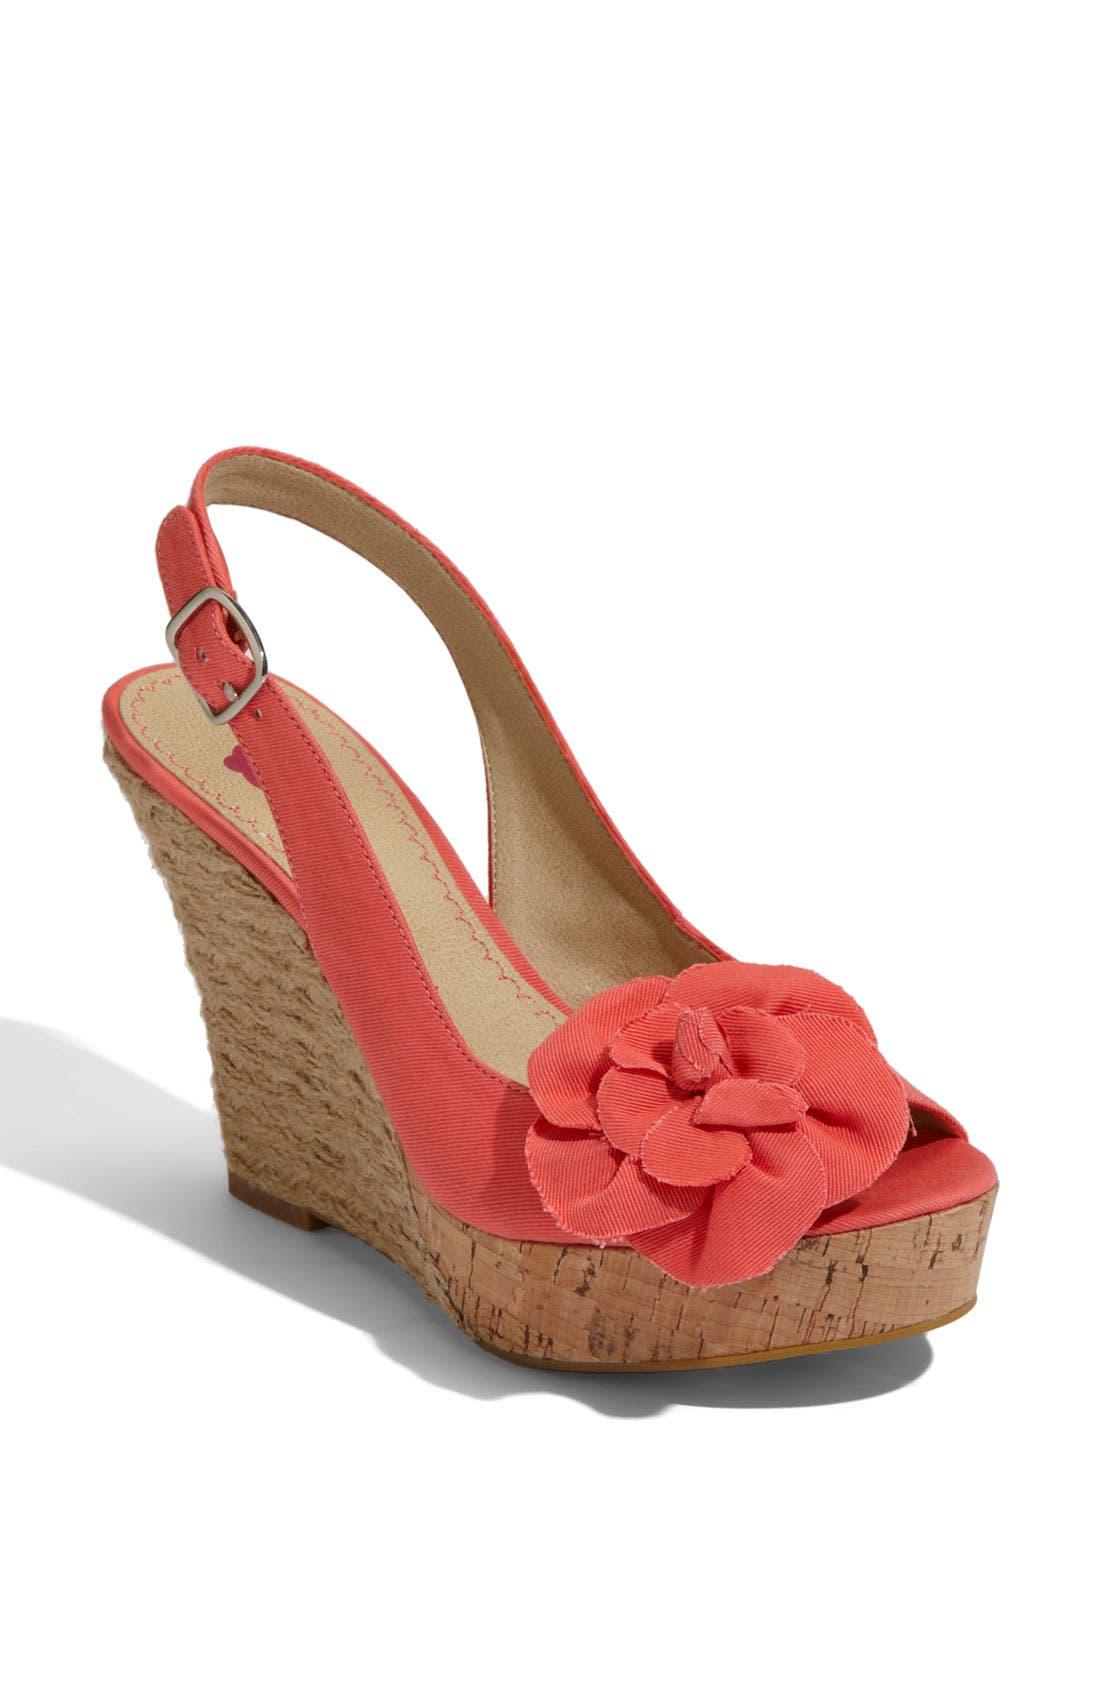 Alternate Image 1 Selected - BP. 'Blooms' Espadrille Slingback Sandal